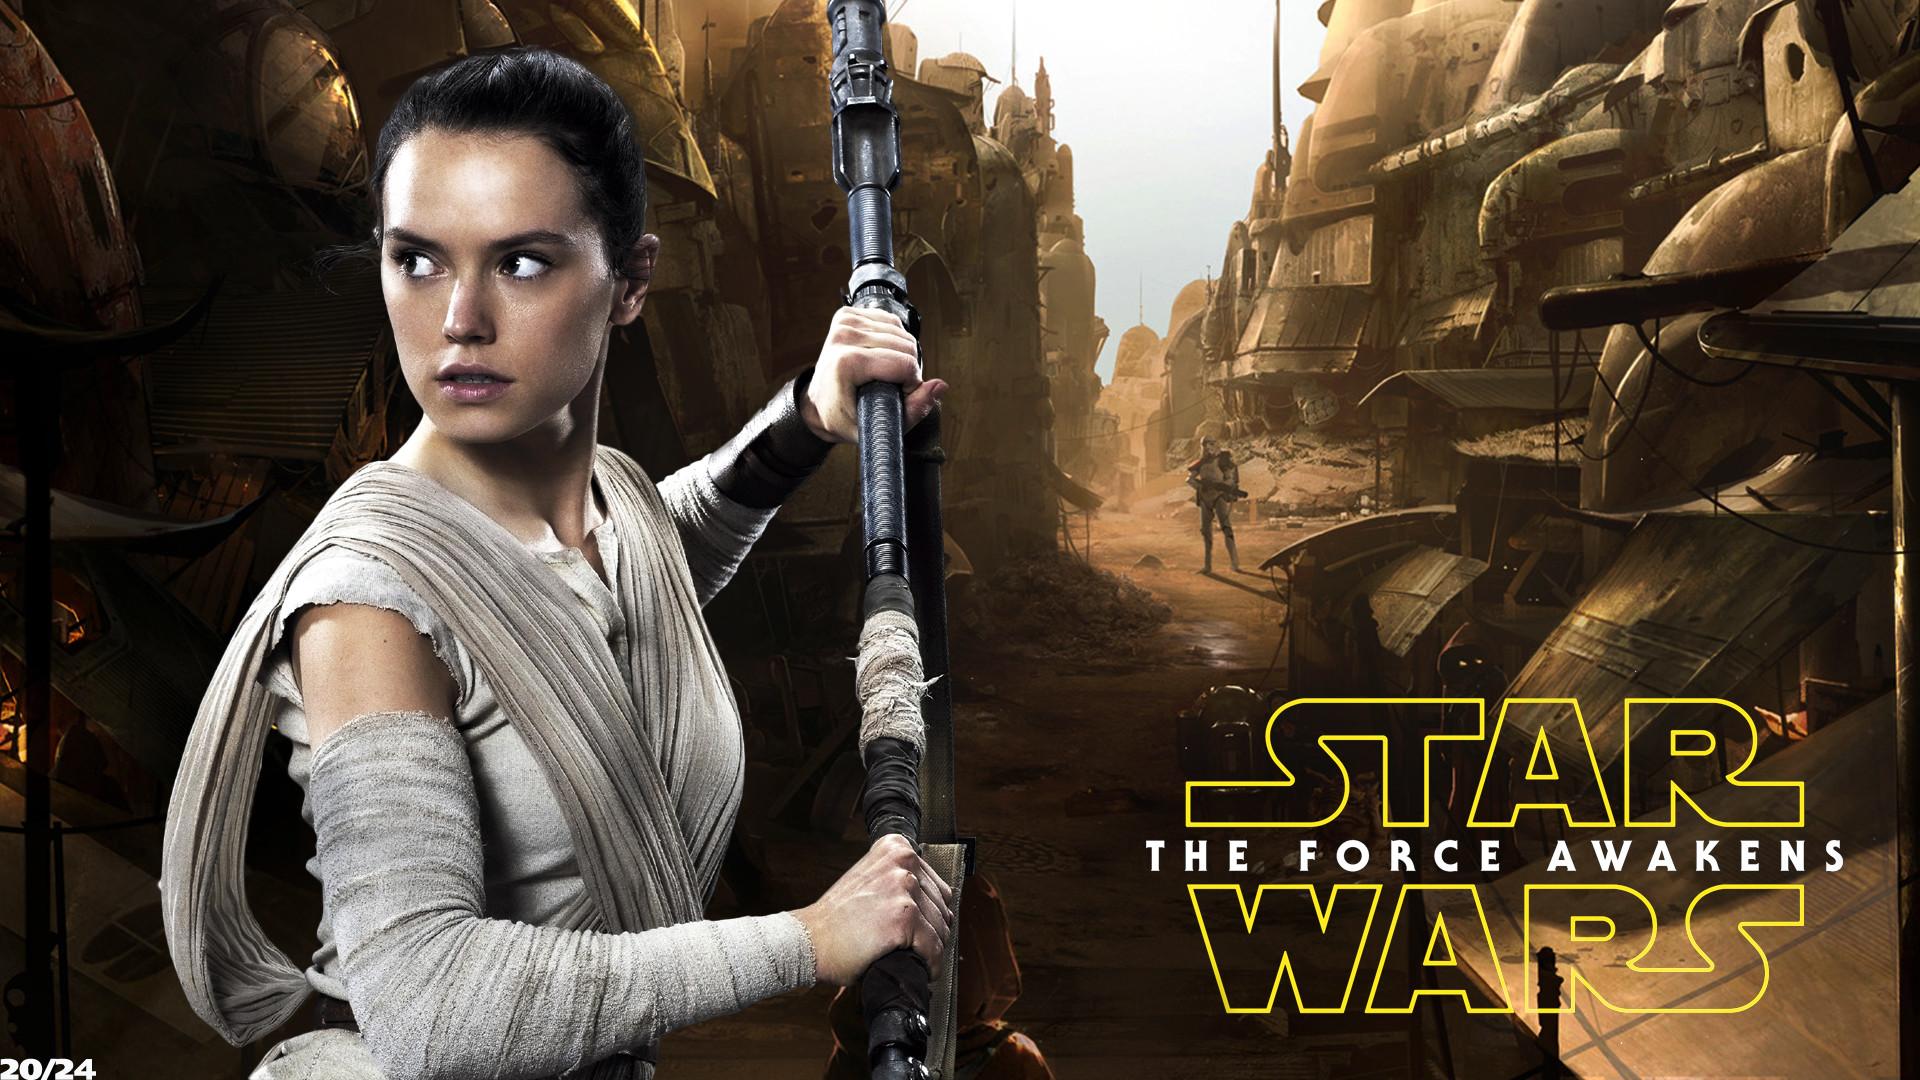 Daisy Ridley Rey- Star Wars001 by FunkyCop999 on DeviantArt